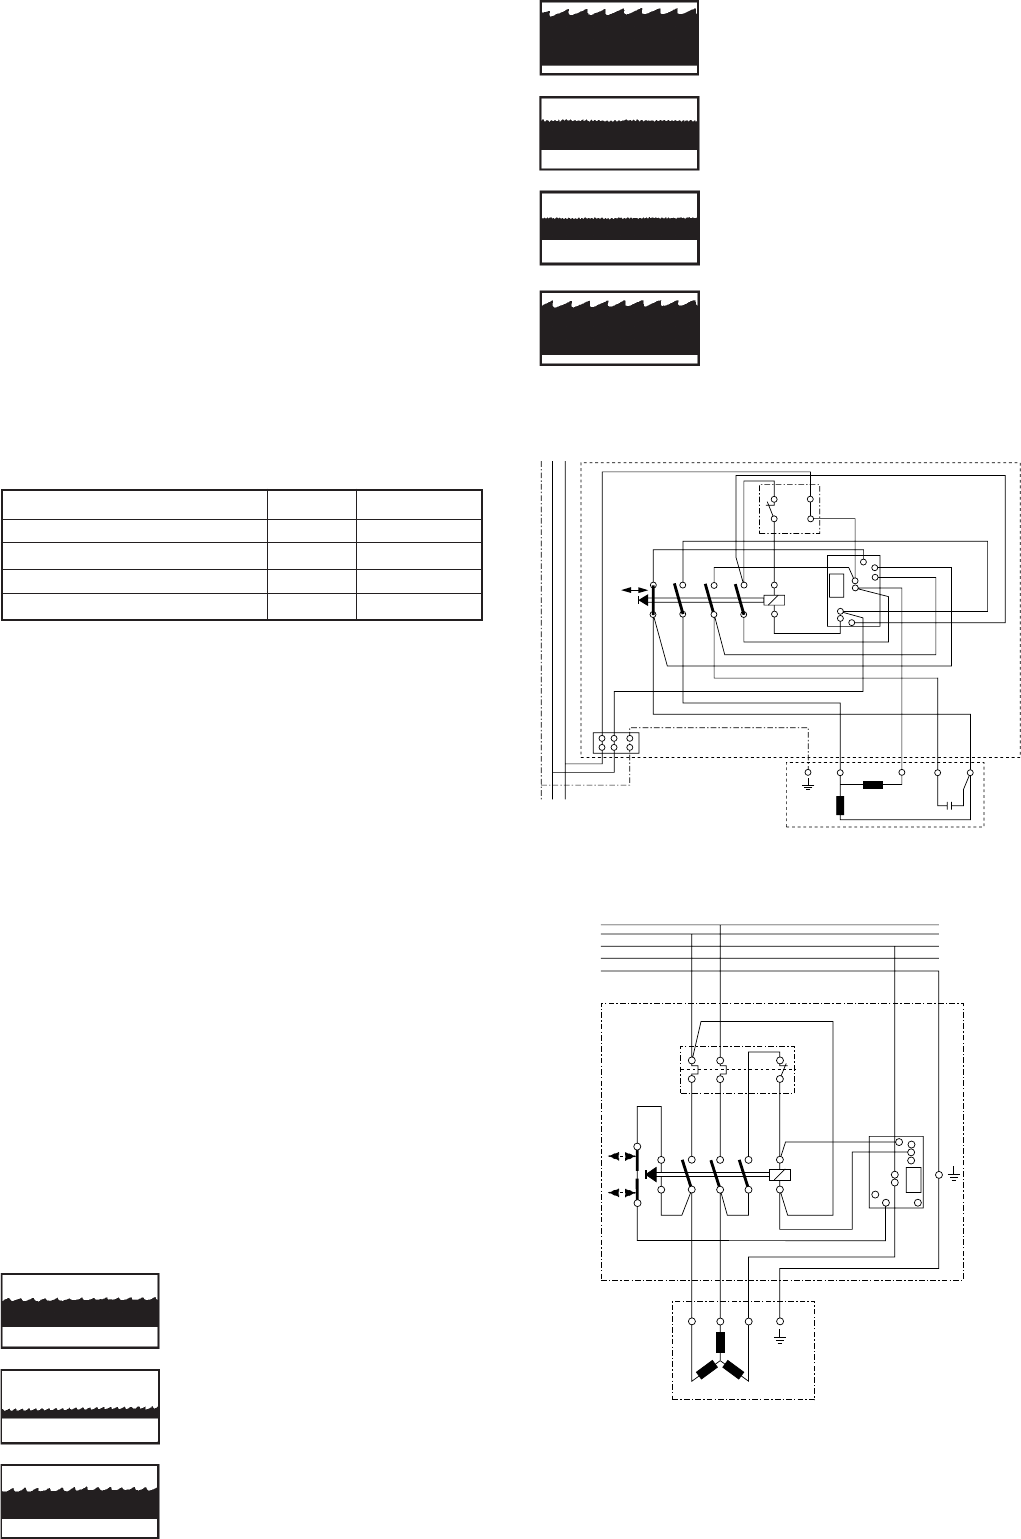 Handleiding Metabo Bas 500 Pagina 11 Van 56 Dansk Deutsch Wiring Diagram Blade For Nf Metals